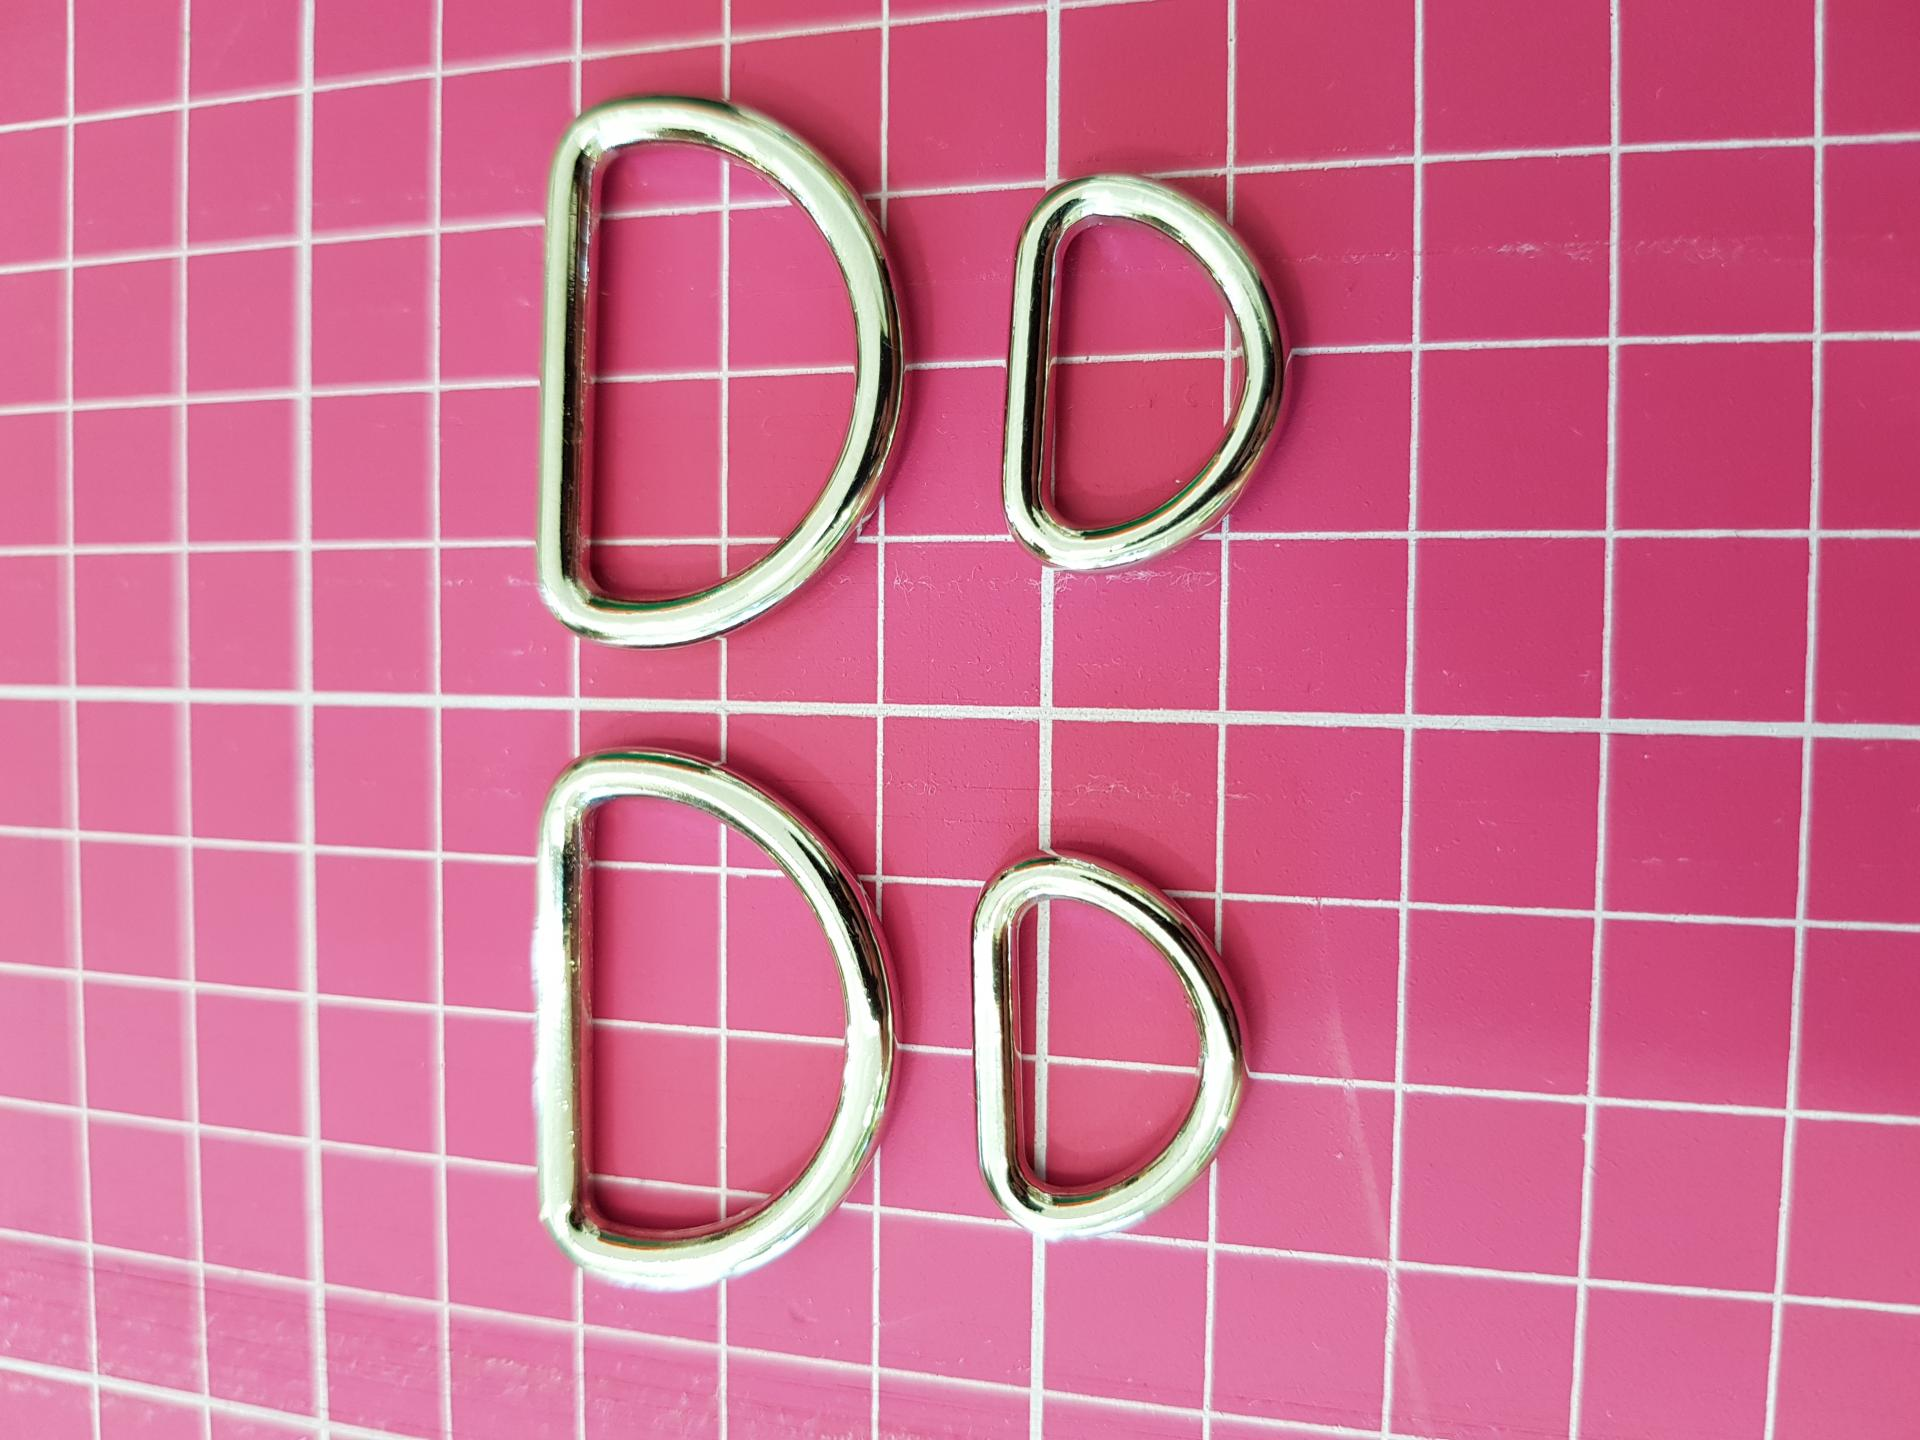 Cierres forma D - Niquel - Pack 2 unidades